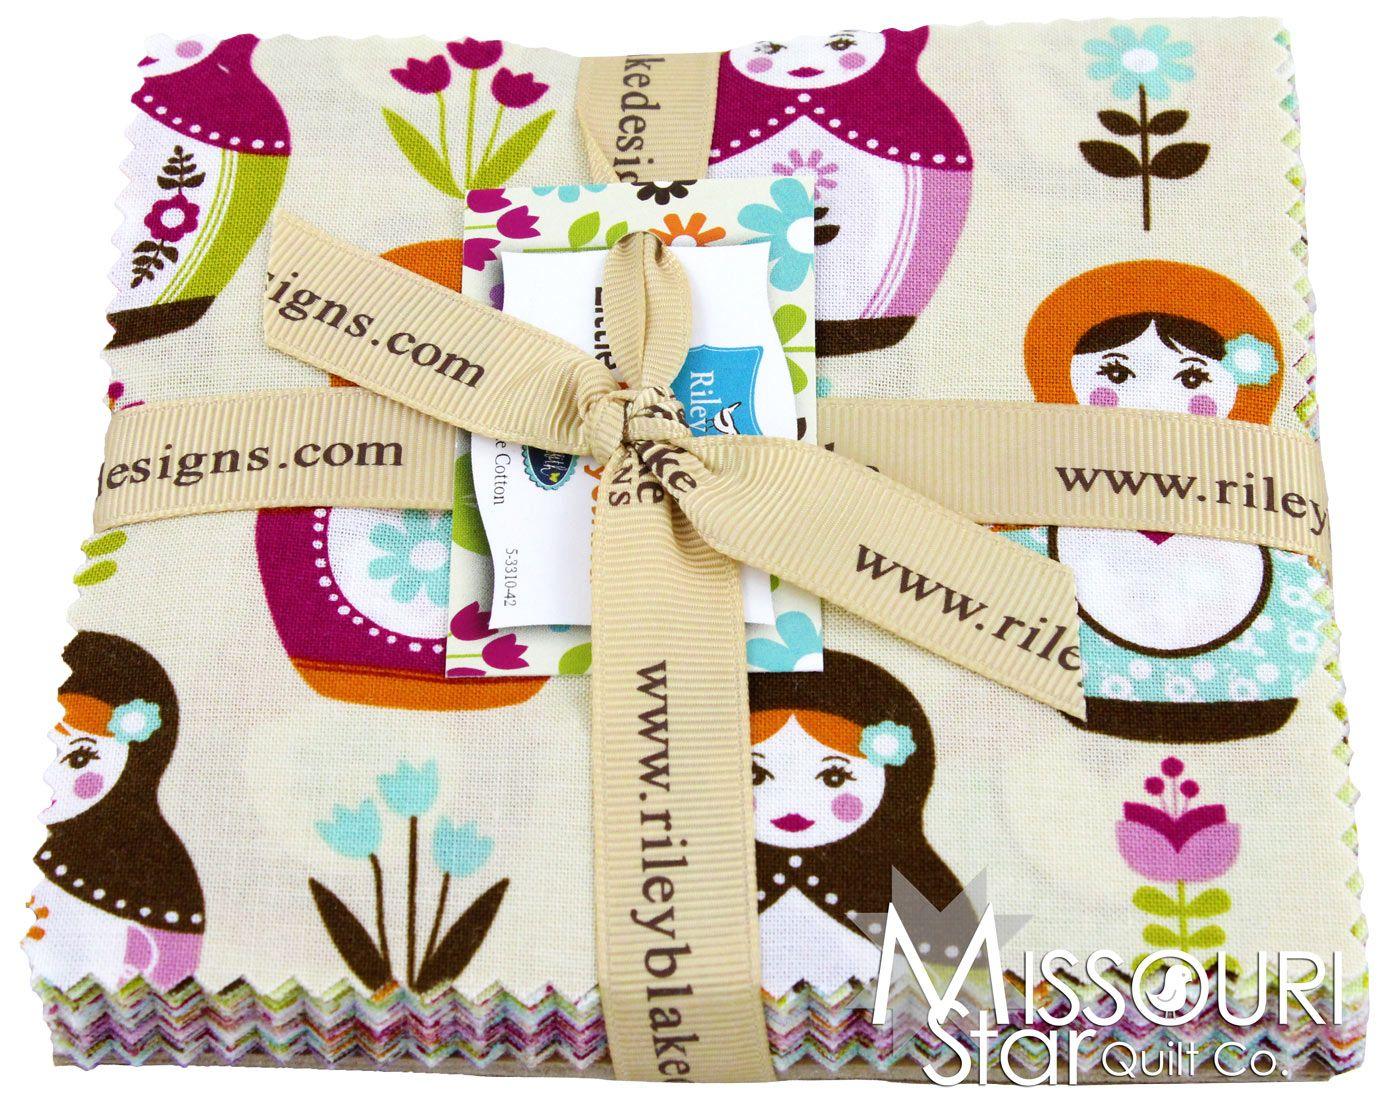 Little Matryoshka Charm Pack from Missouri Star Quilt Co Love love love love love love!!!!!